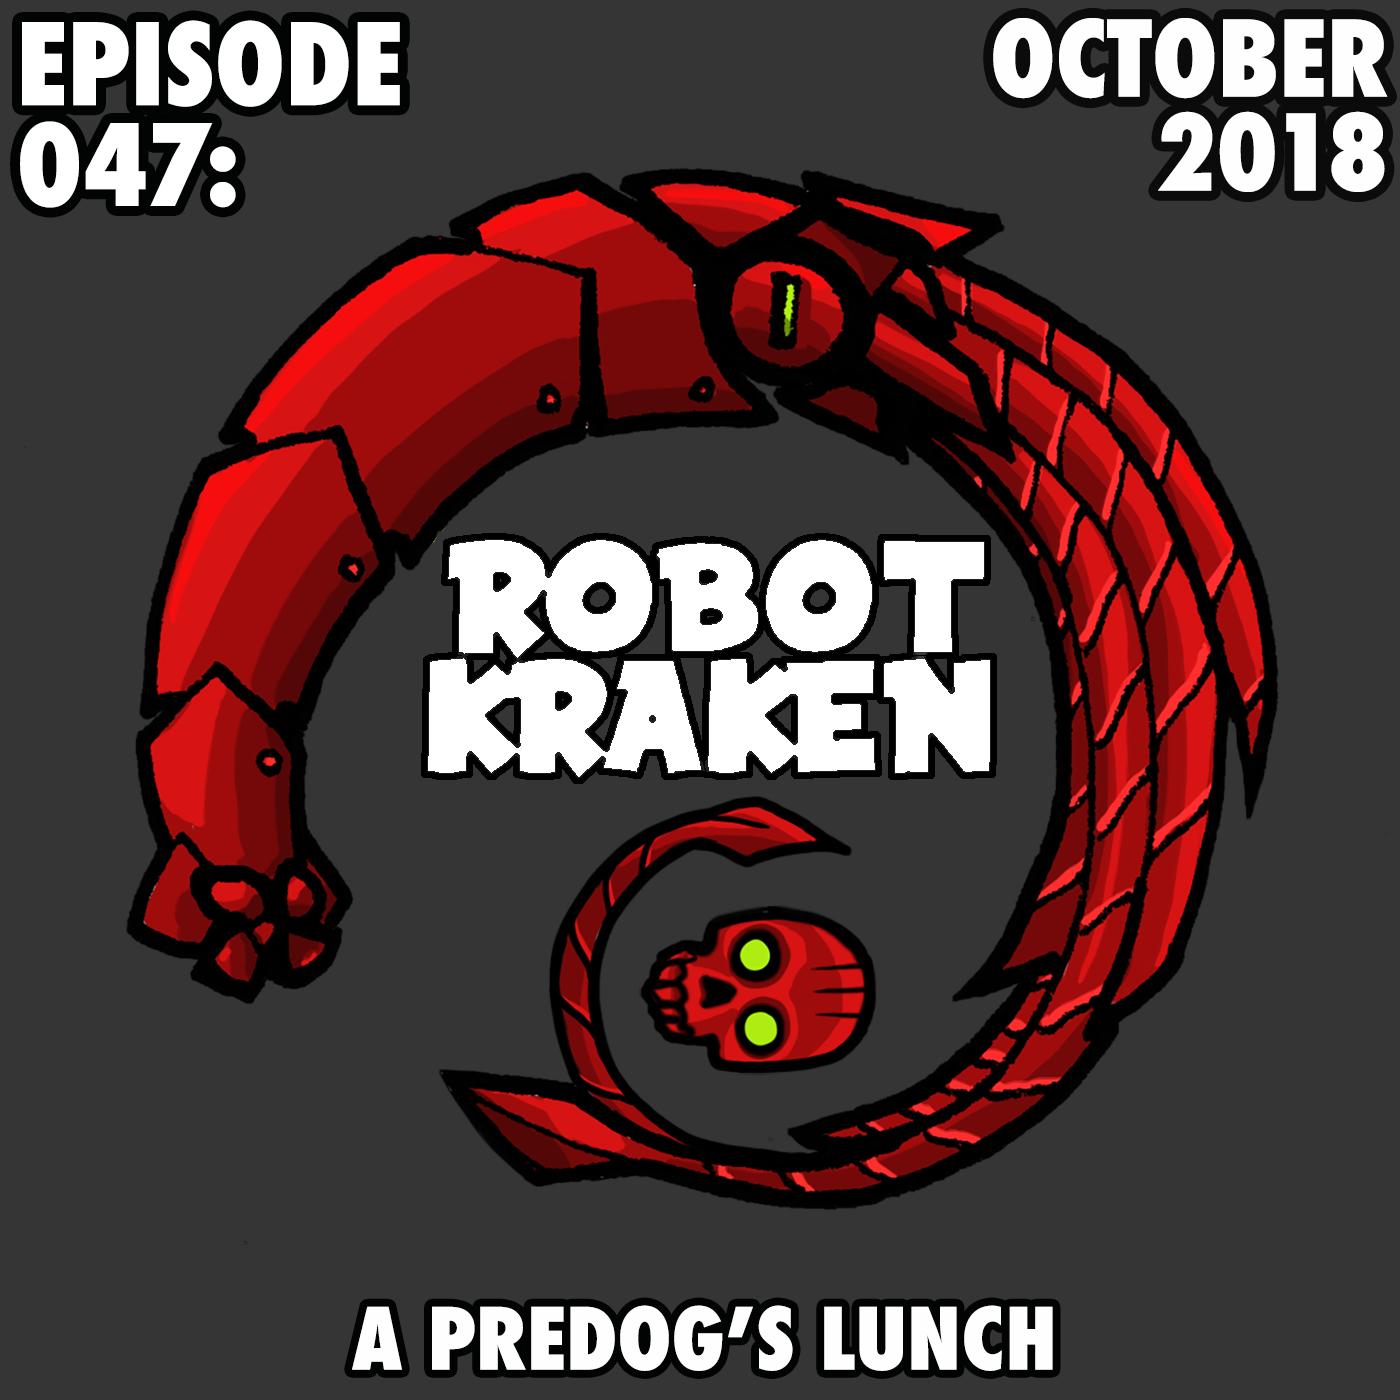 Robot-Kraken-047-Cover.png